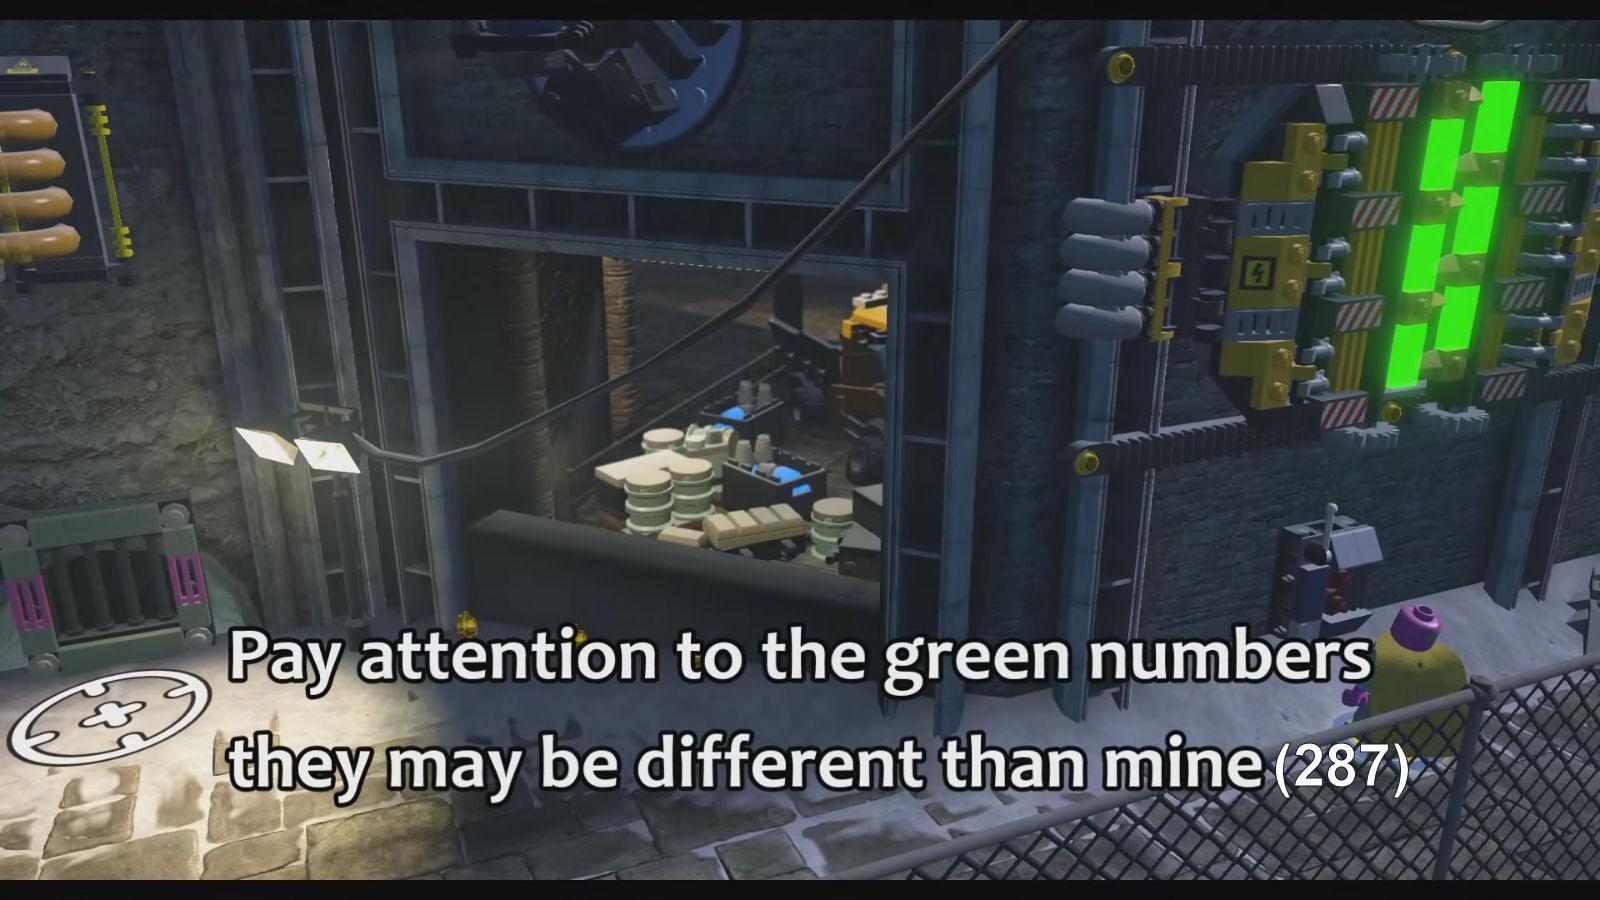 Lego Marvel's Avengers Red Brick 2: Studs x2 Location